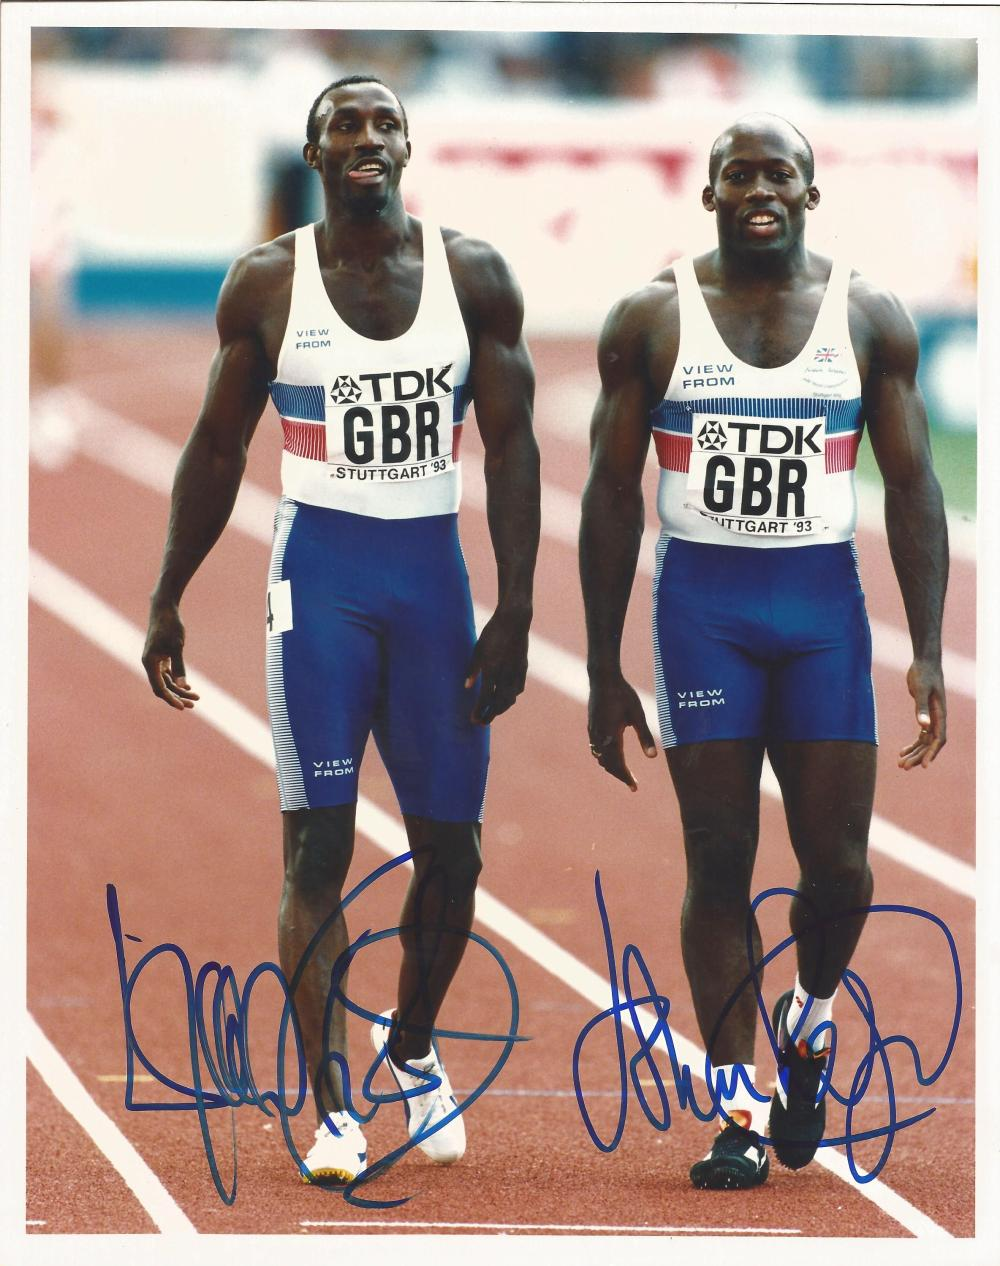 Sport Linford Christie and John Regis 10x8 signed colour photo. John Paul Lyndon Regis, MBE (born 13